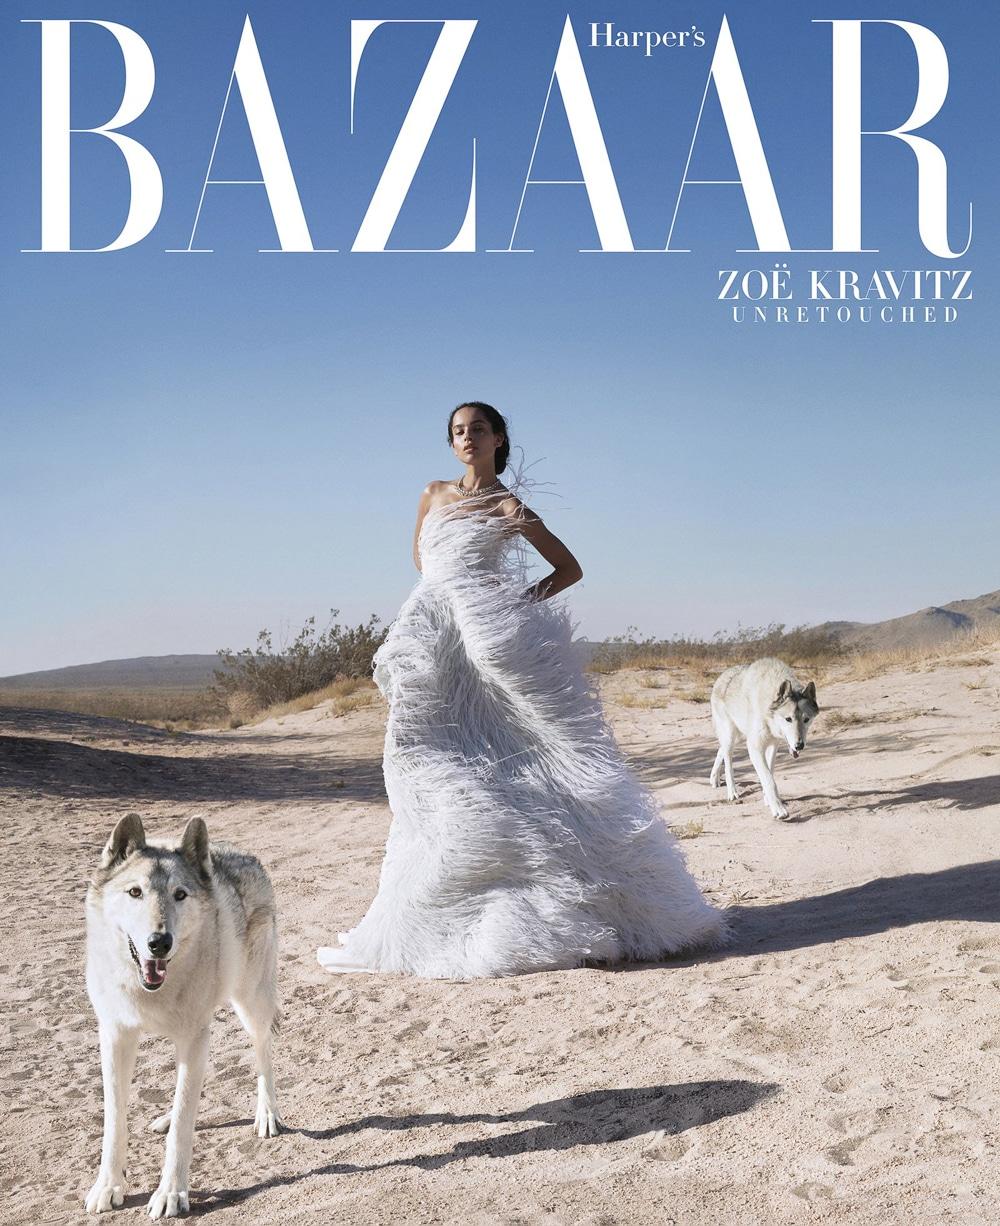 Harpers-Bazaar-Zoe-Kravitz-Camilla-Akrans-4.jpg